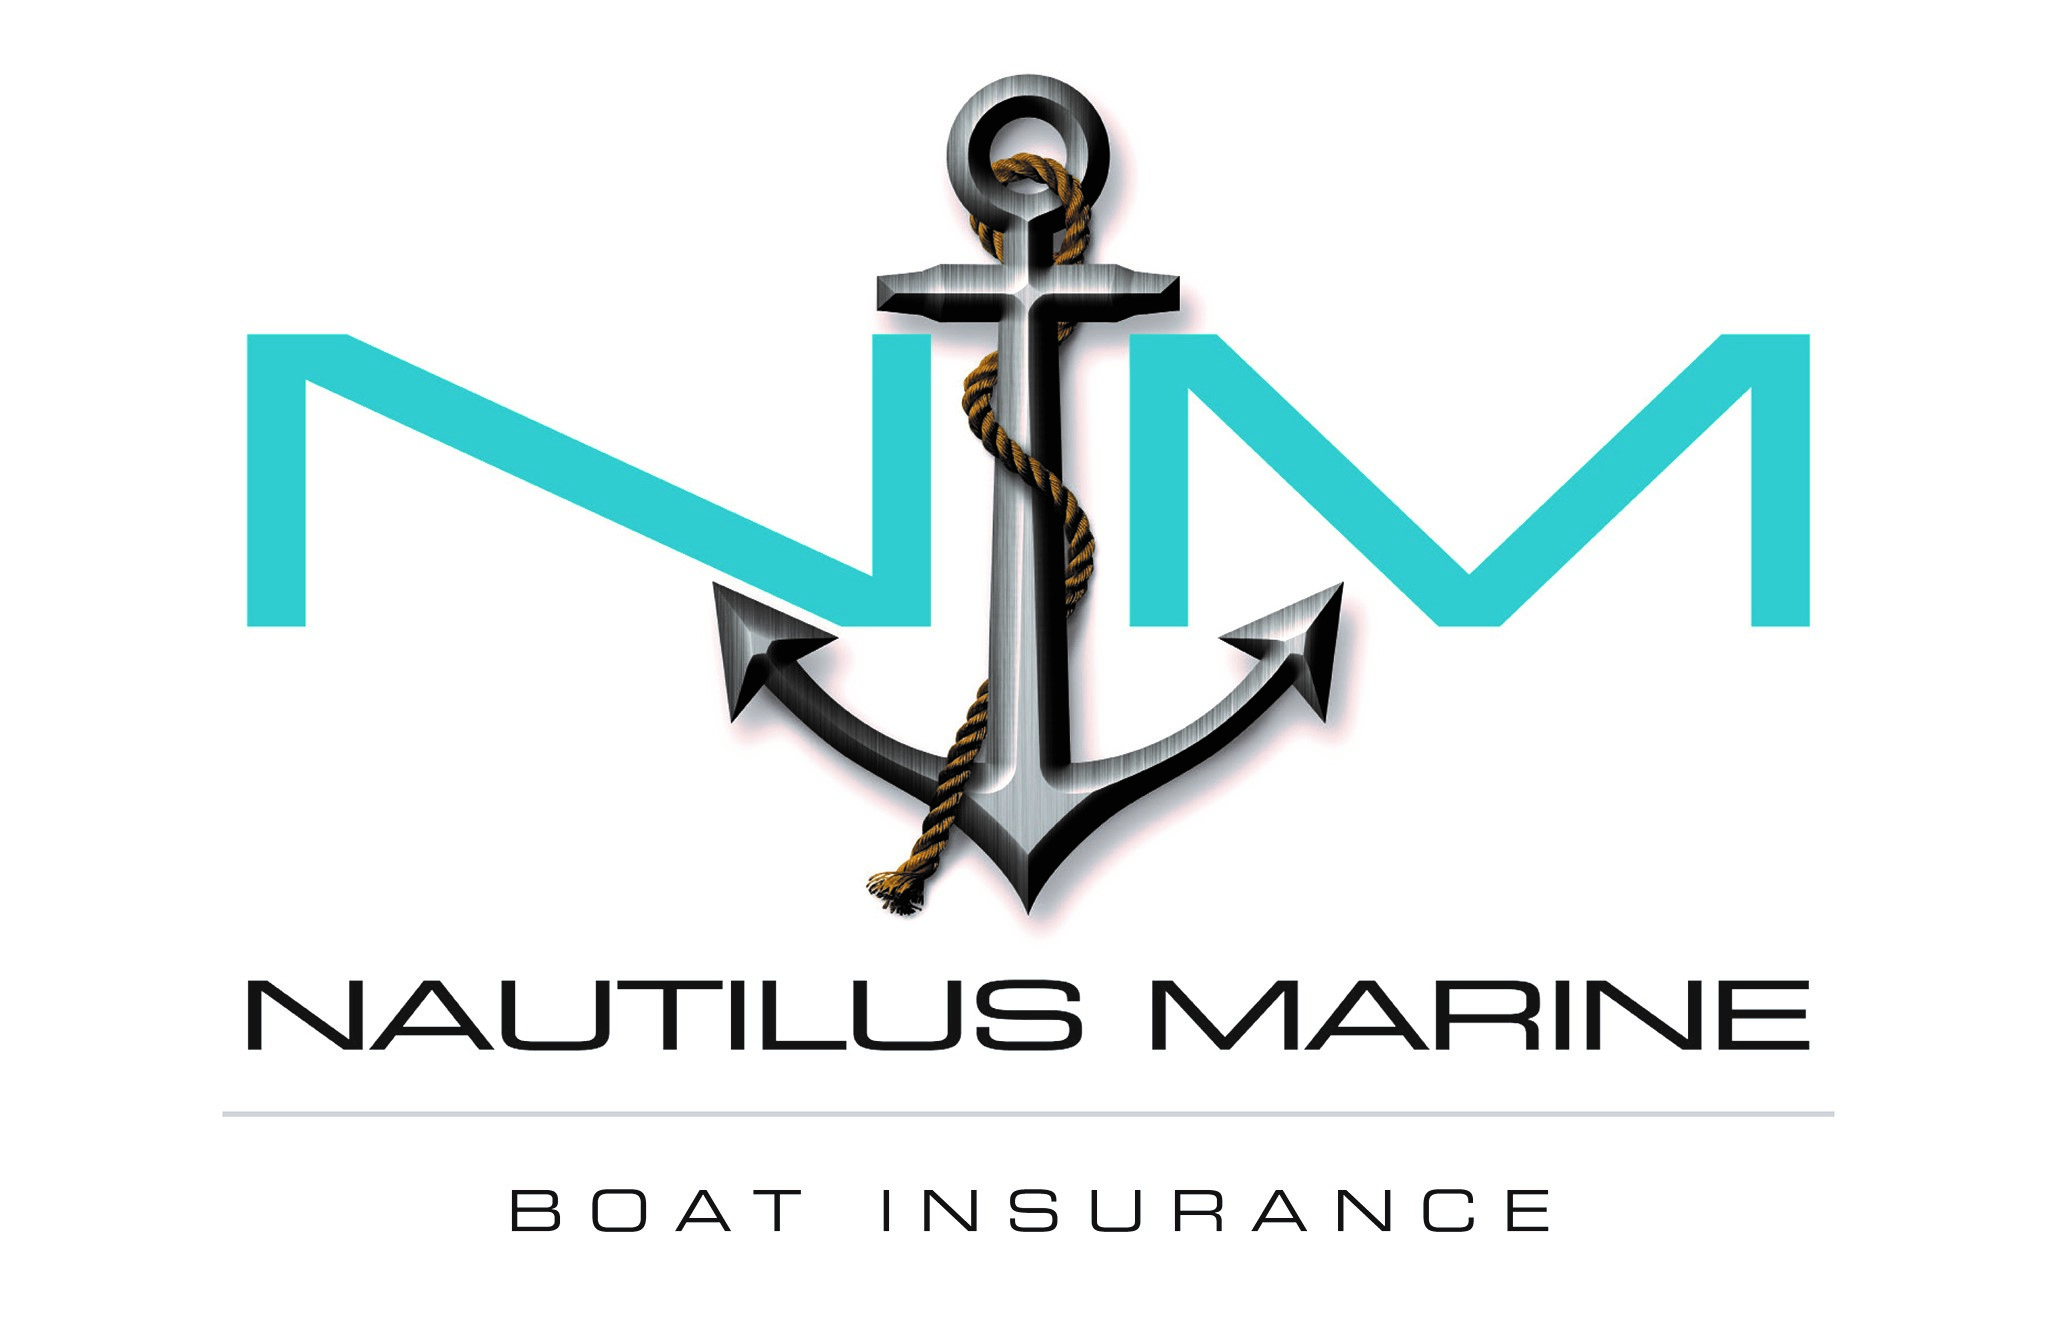 Nautilus Marine Boat Insurance